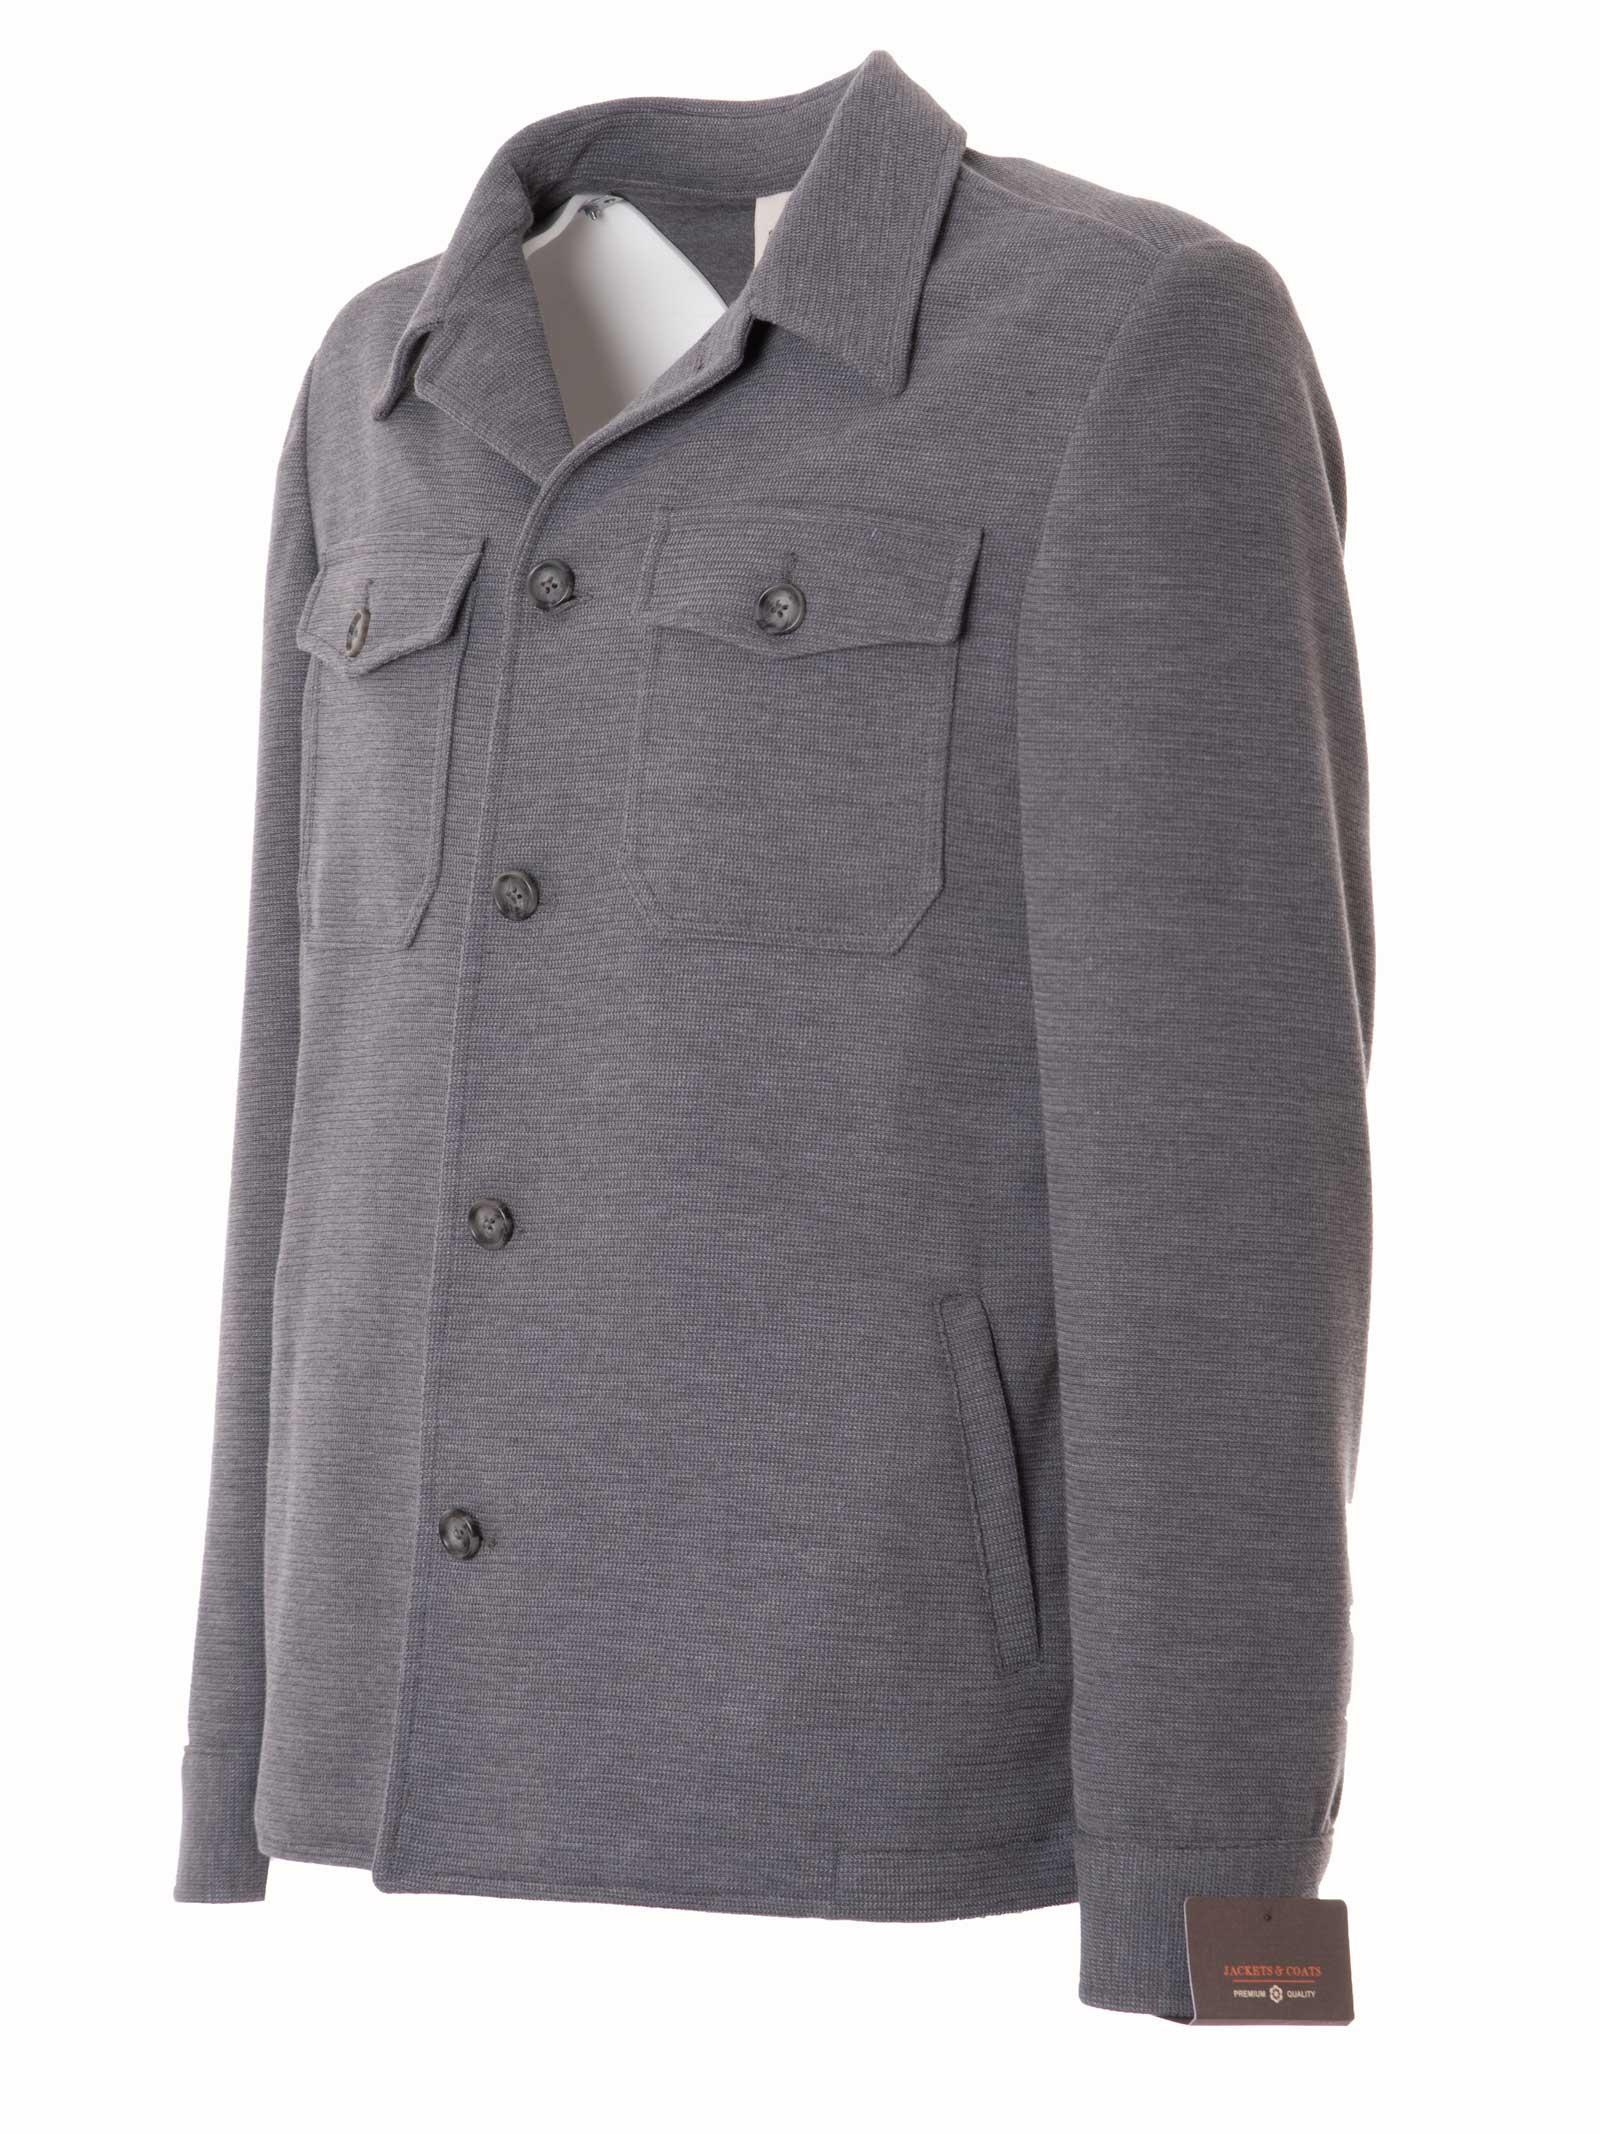 giacca/camicia in maglia GABARDINE | GABCAMYCOL.23